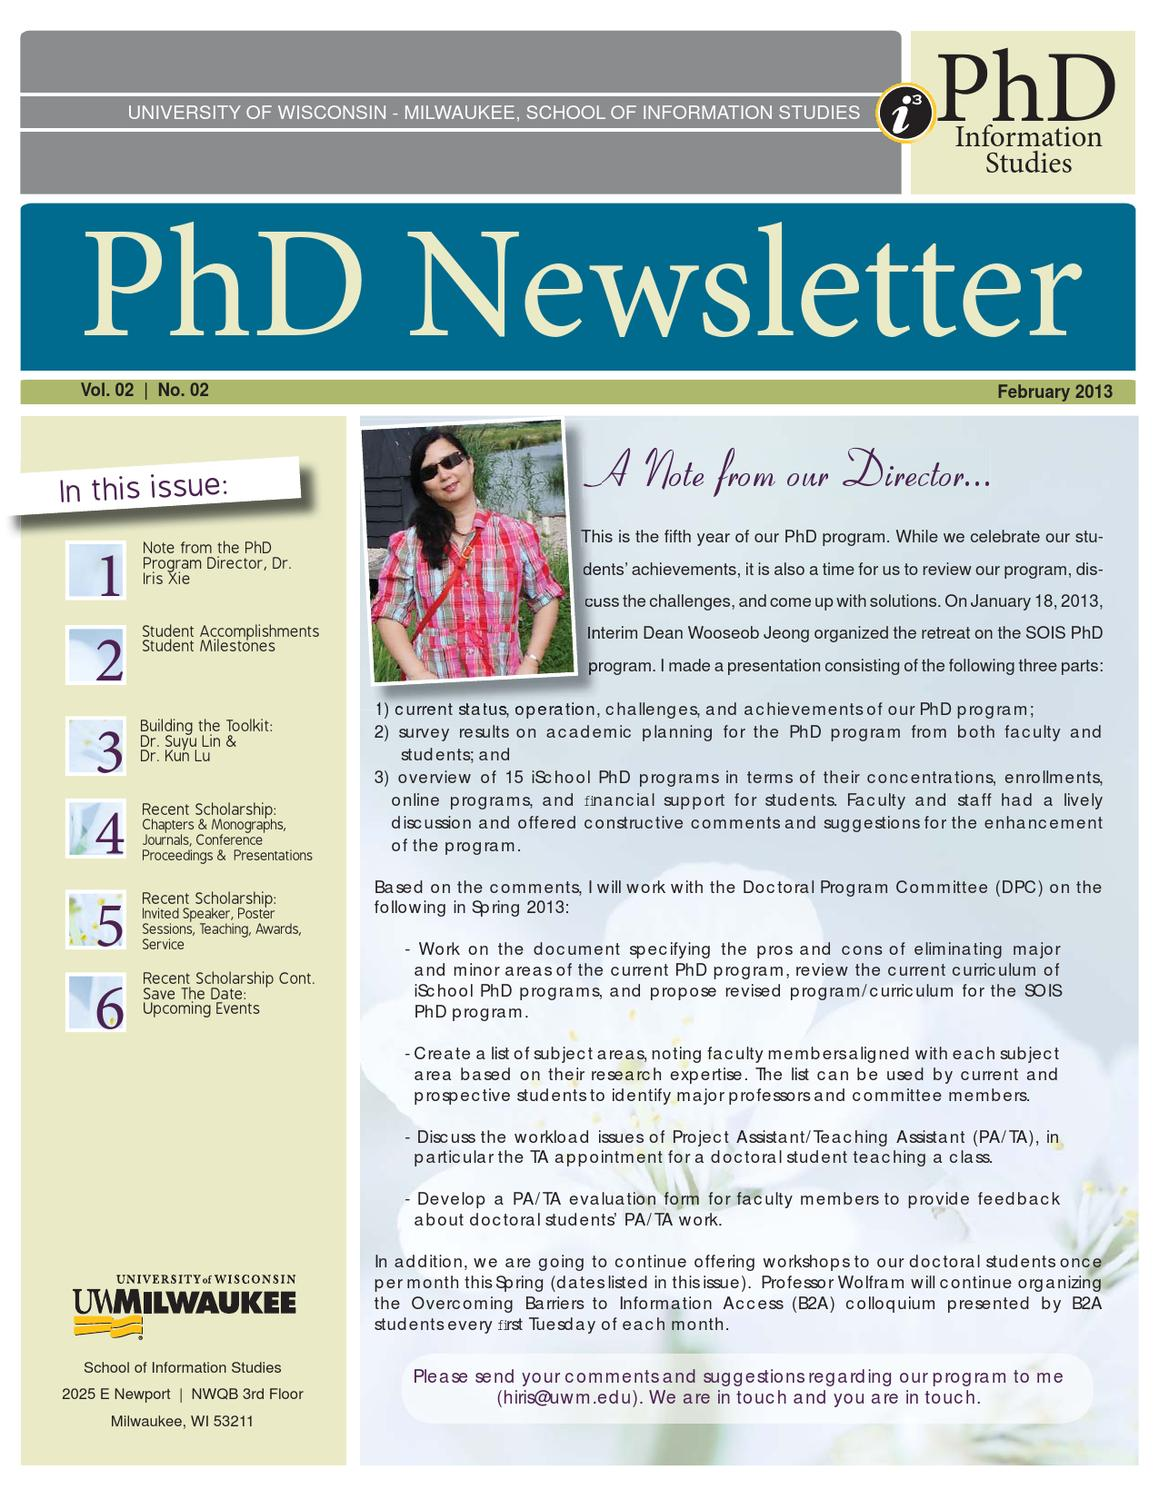 PhD Newsletter - Spring 2013 by UW-Milwaukee, School of